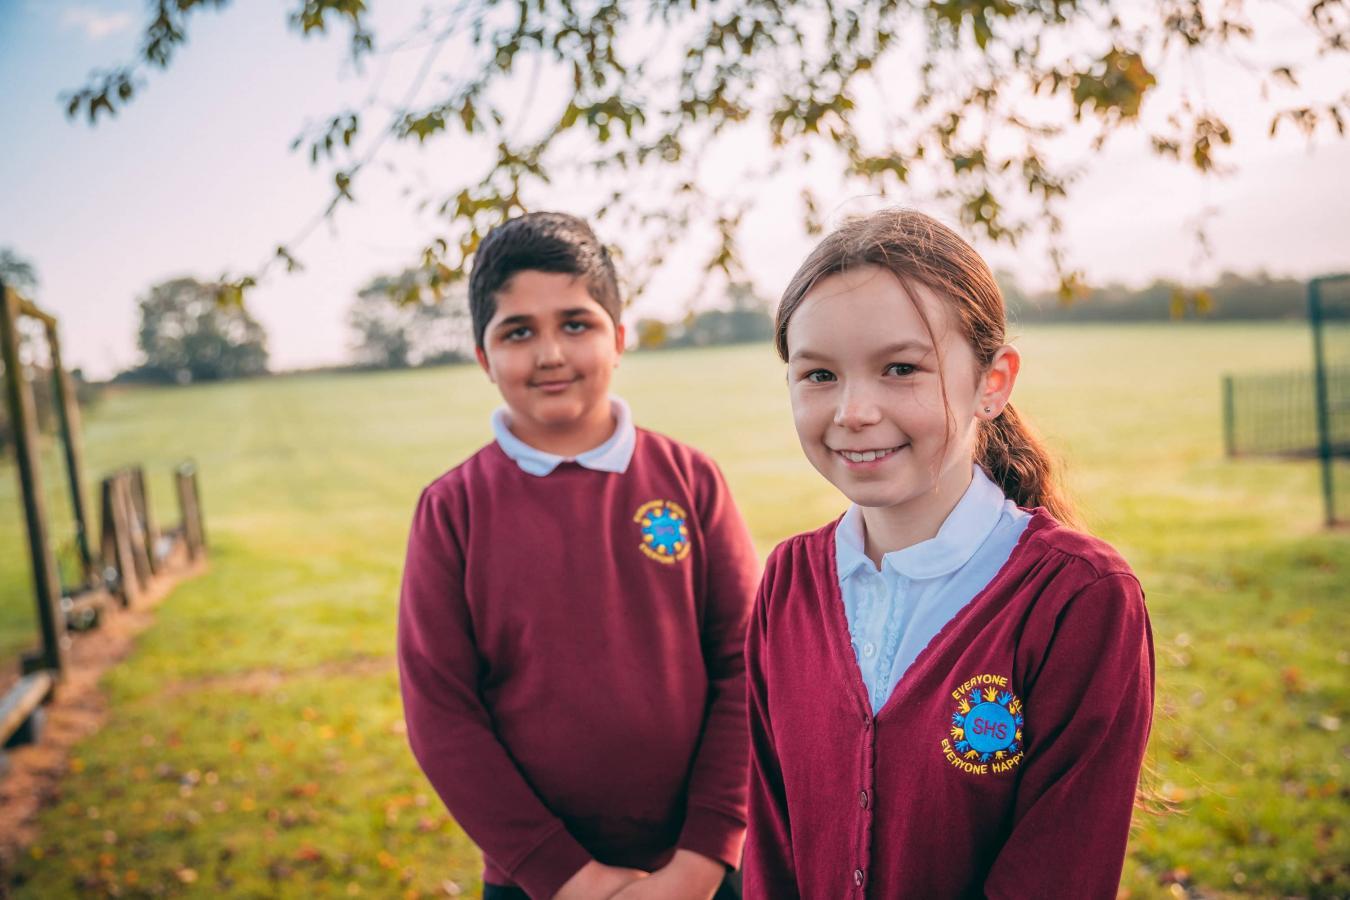 Pupils in South Hiendley uniform